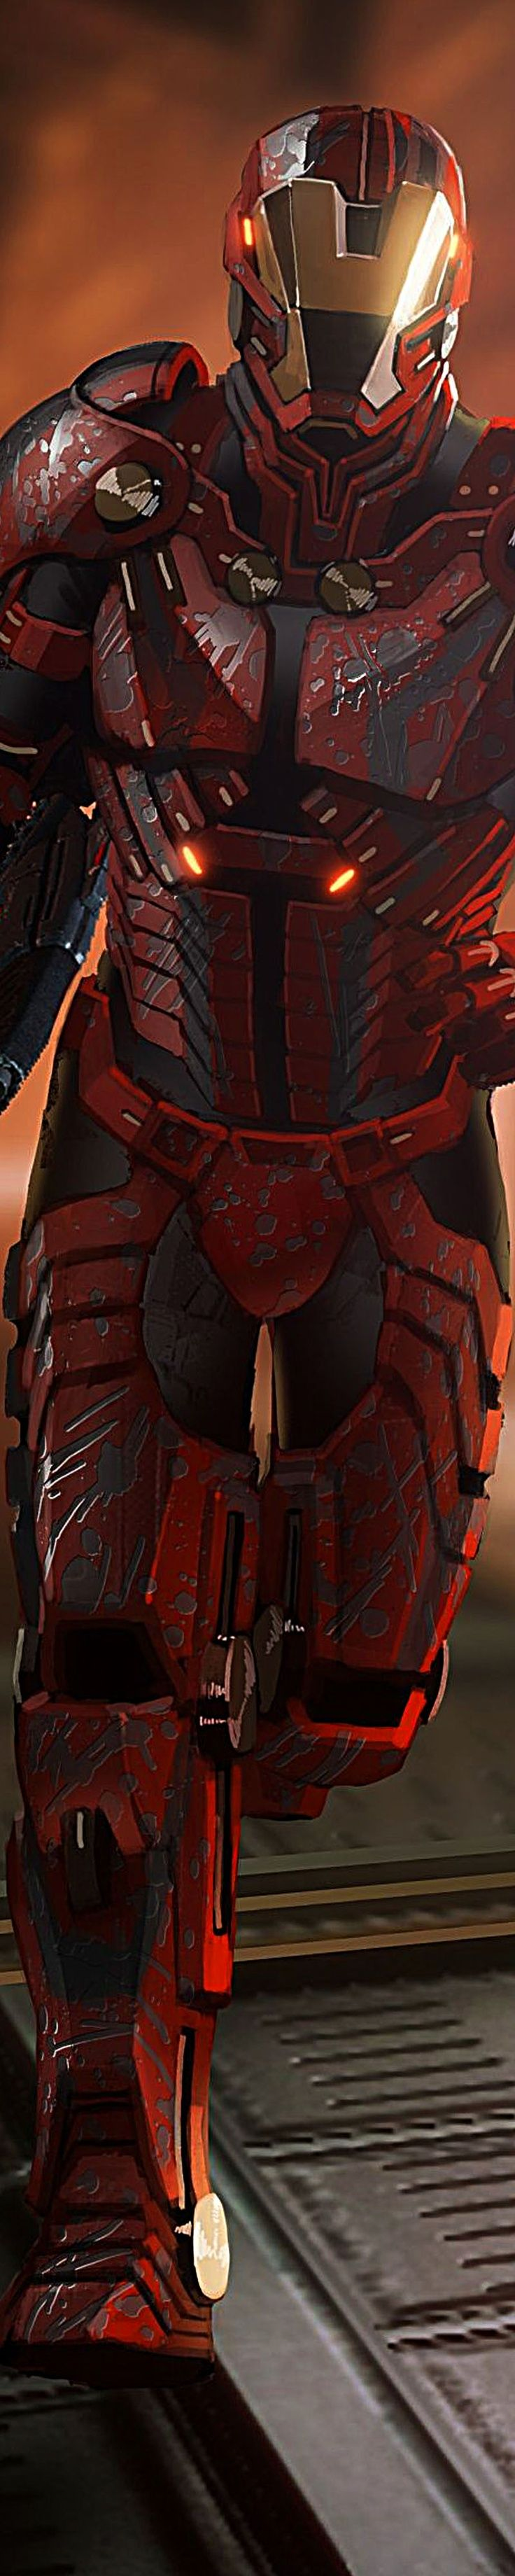 1246 best robotics mechanical images on pinterest armors